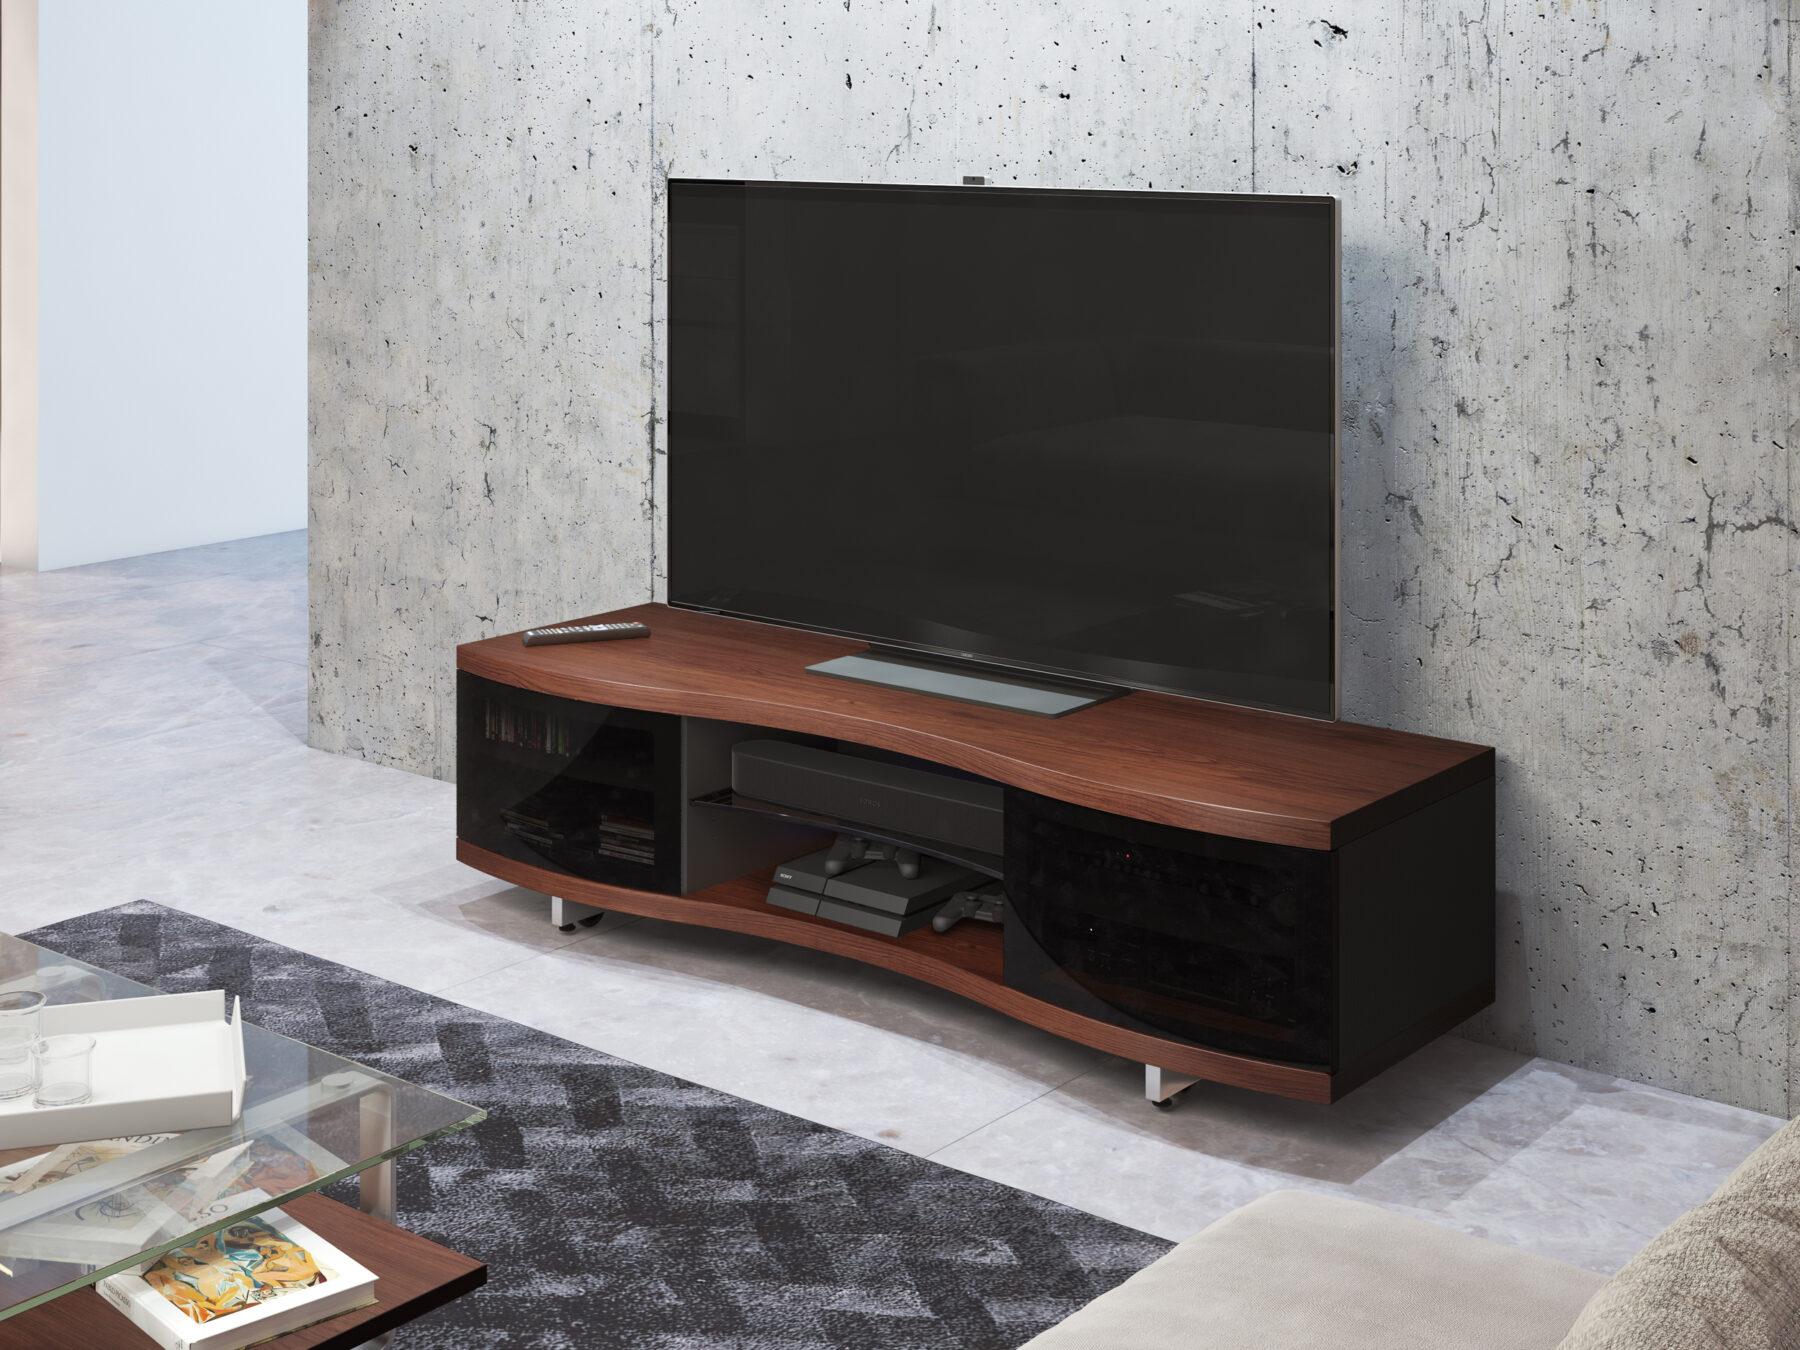 ola-8137-chocolate-bdi-modern-tv-cabinet-4